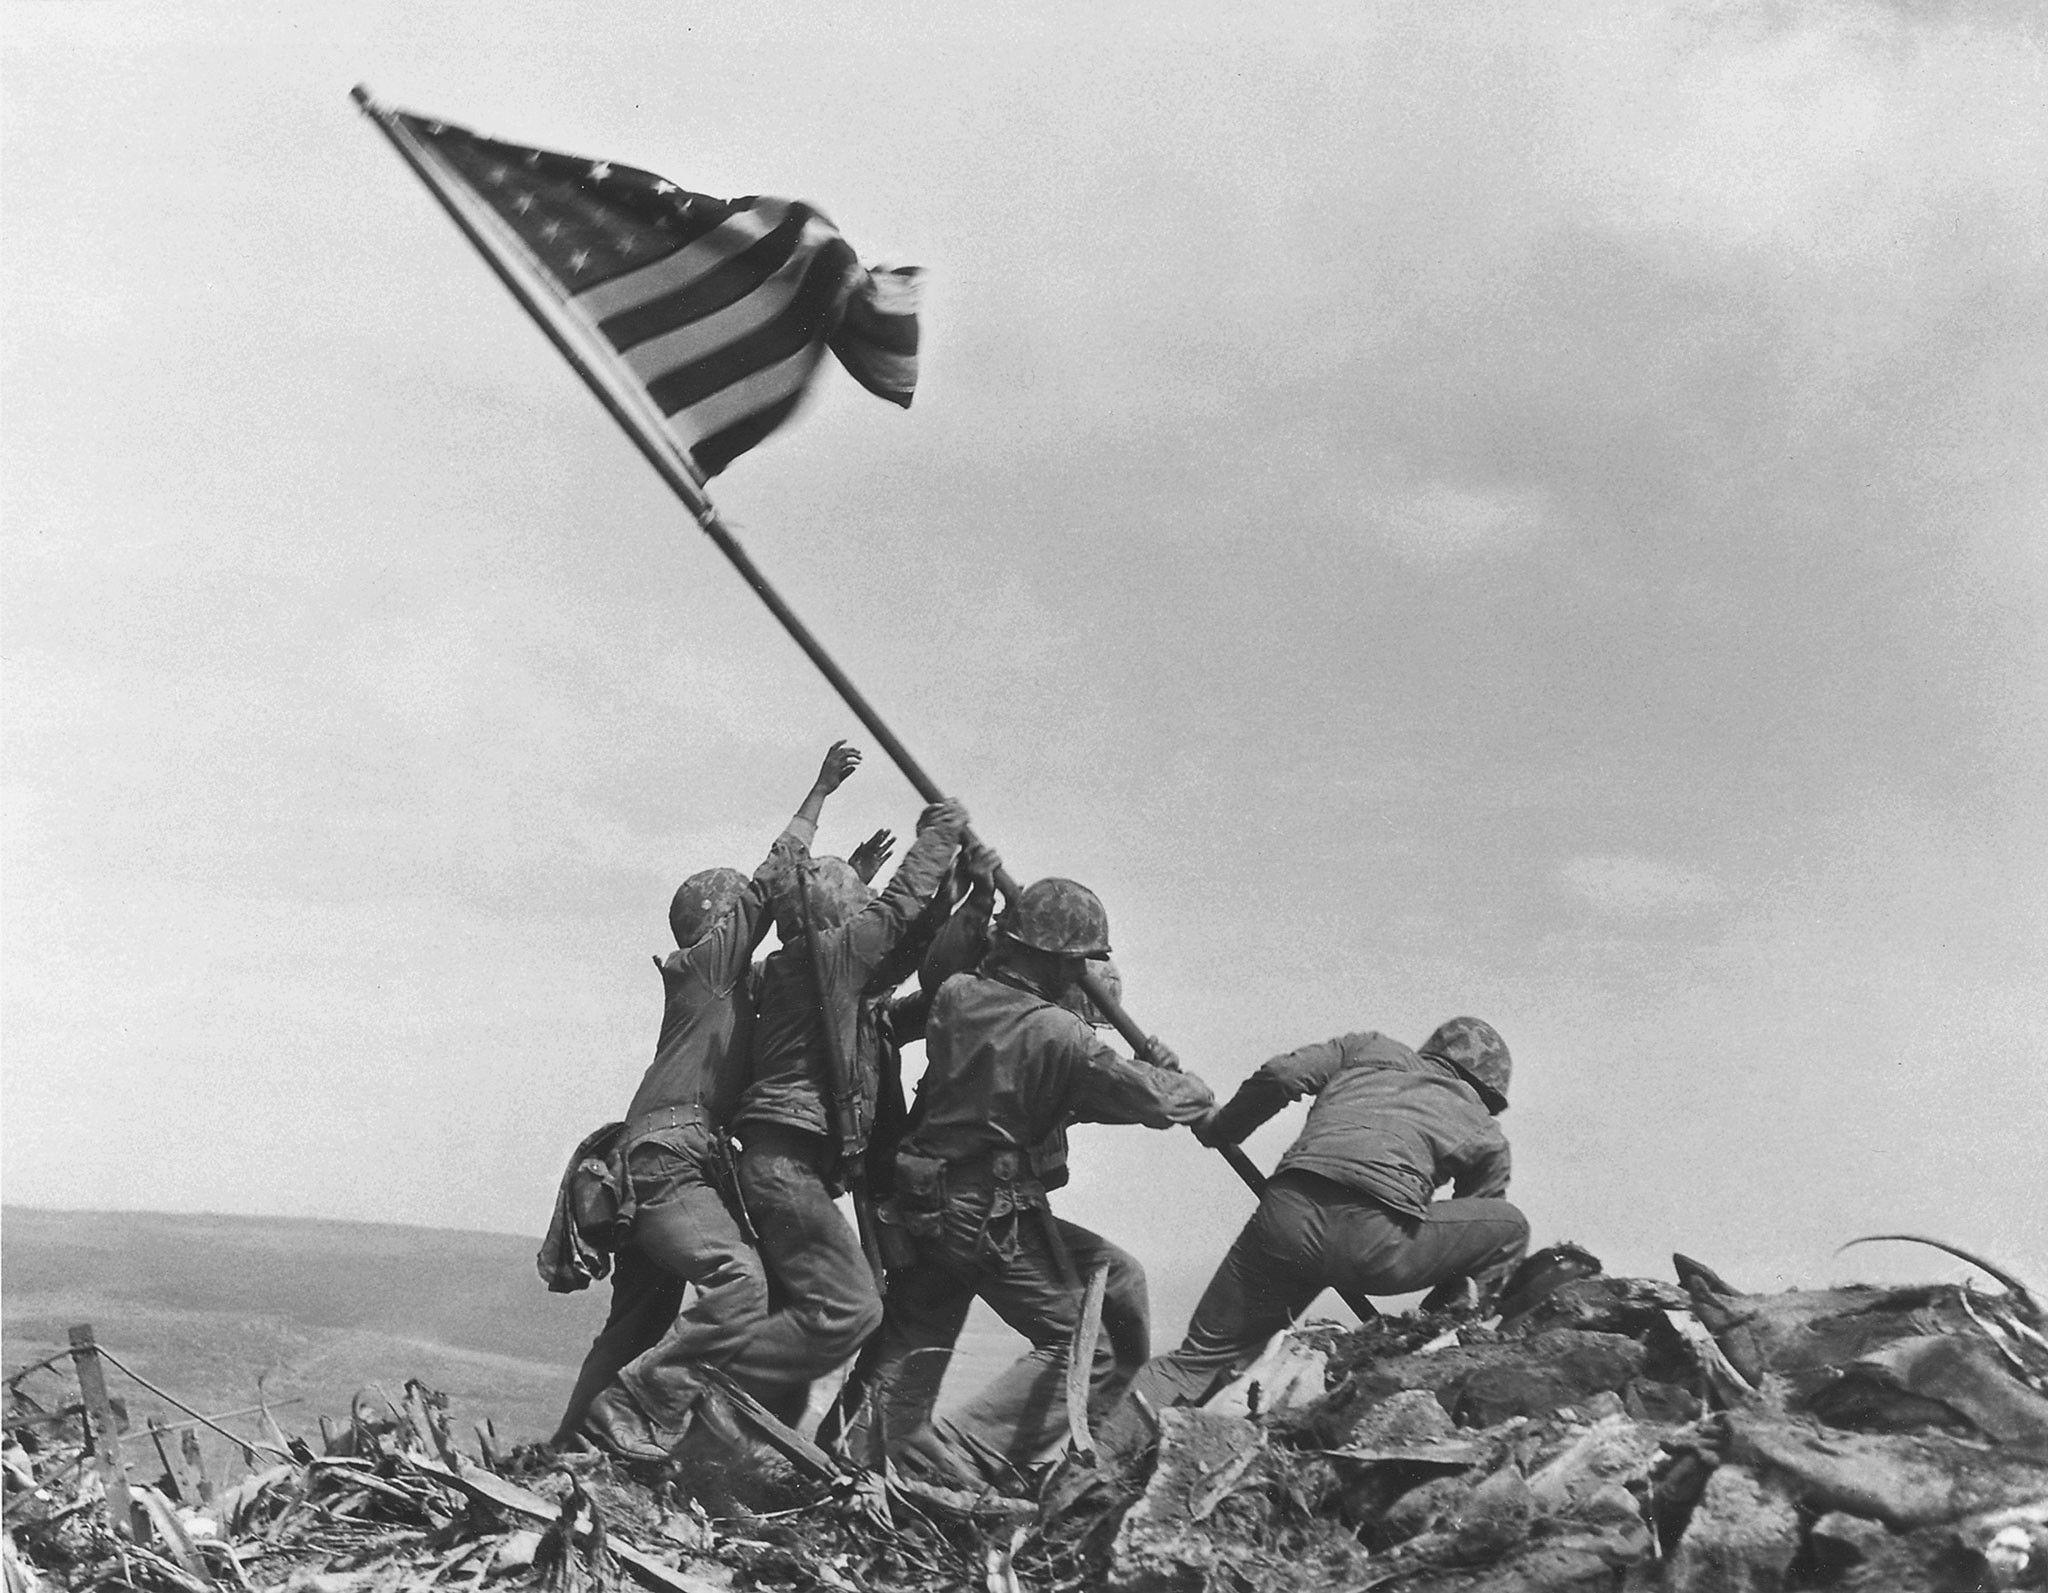 75 years later, the Battle of Iwo Jima still haunts this veteran